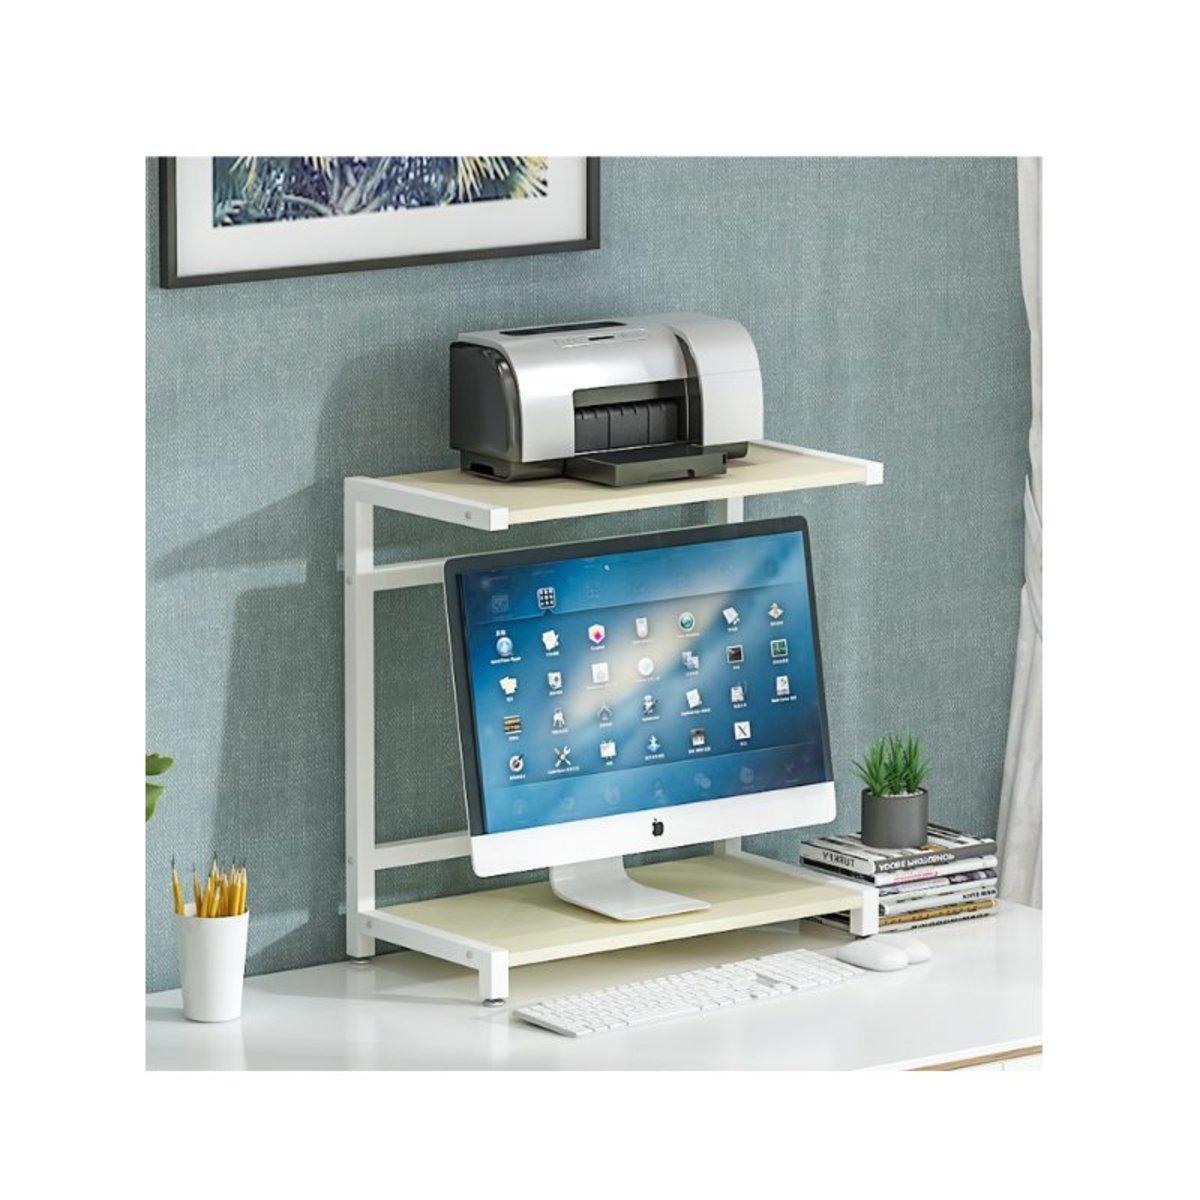 Computer monitor printer rack